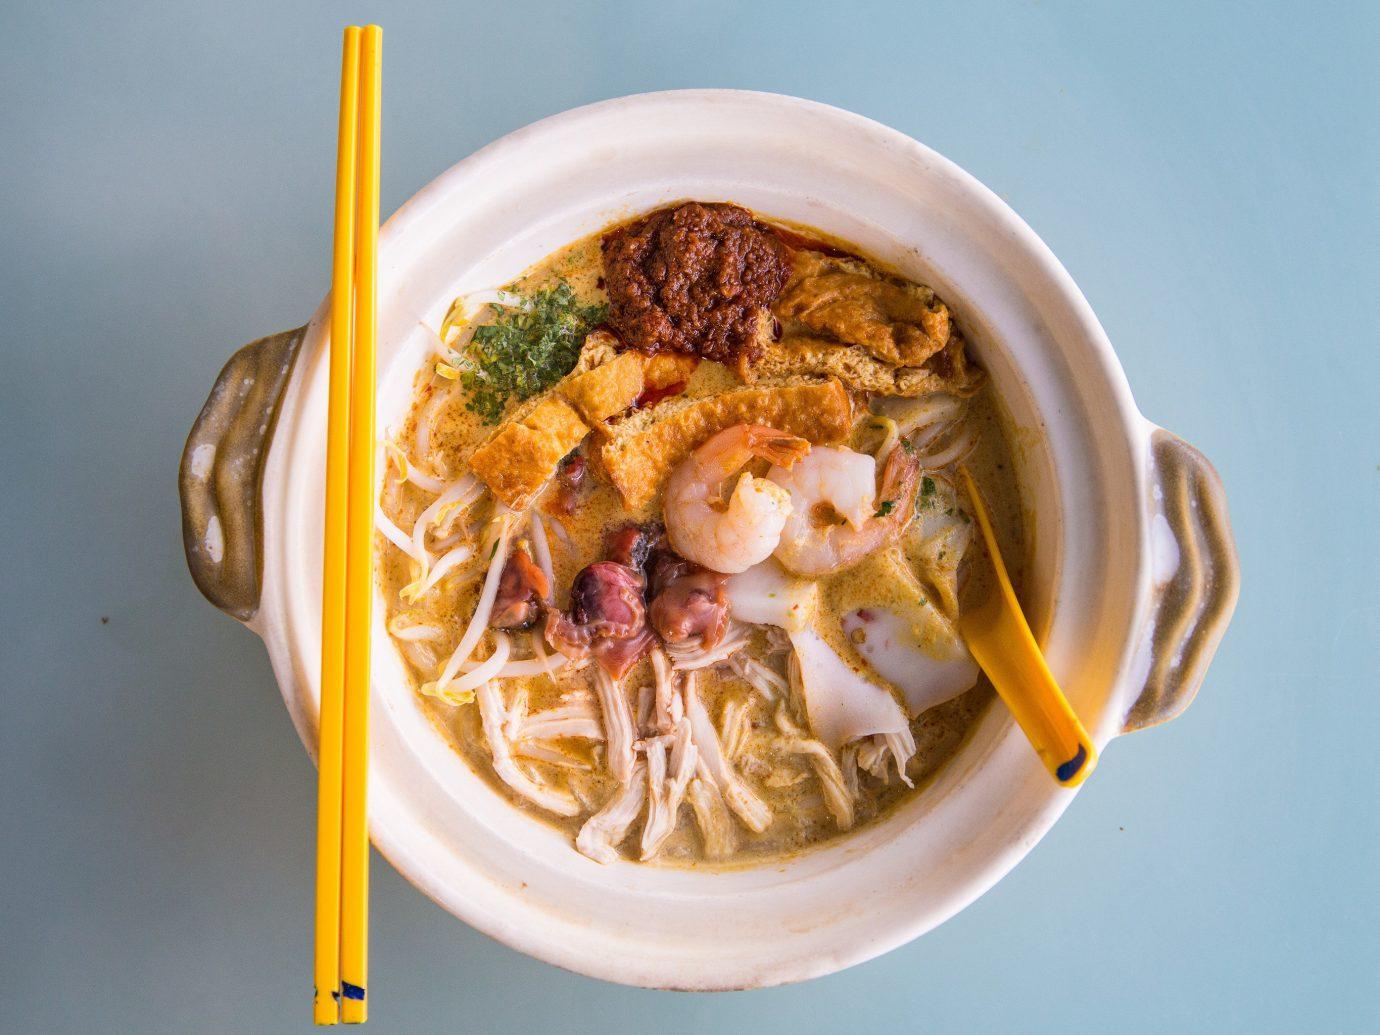 Travel Tips food dish plate cuisine soup produce noodle meal noodle soup asian food thai food pasta dessert